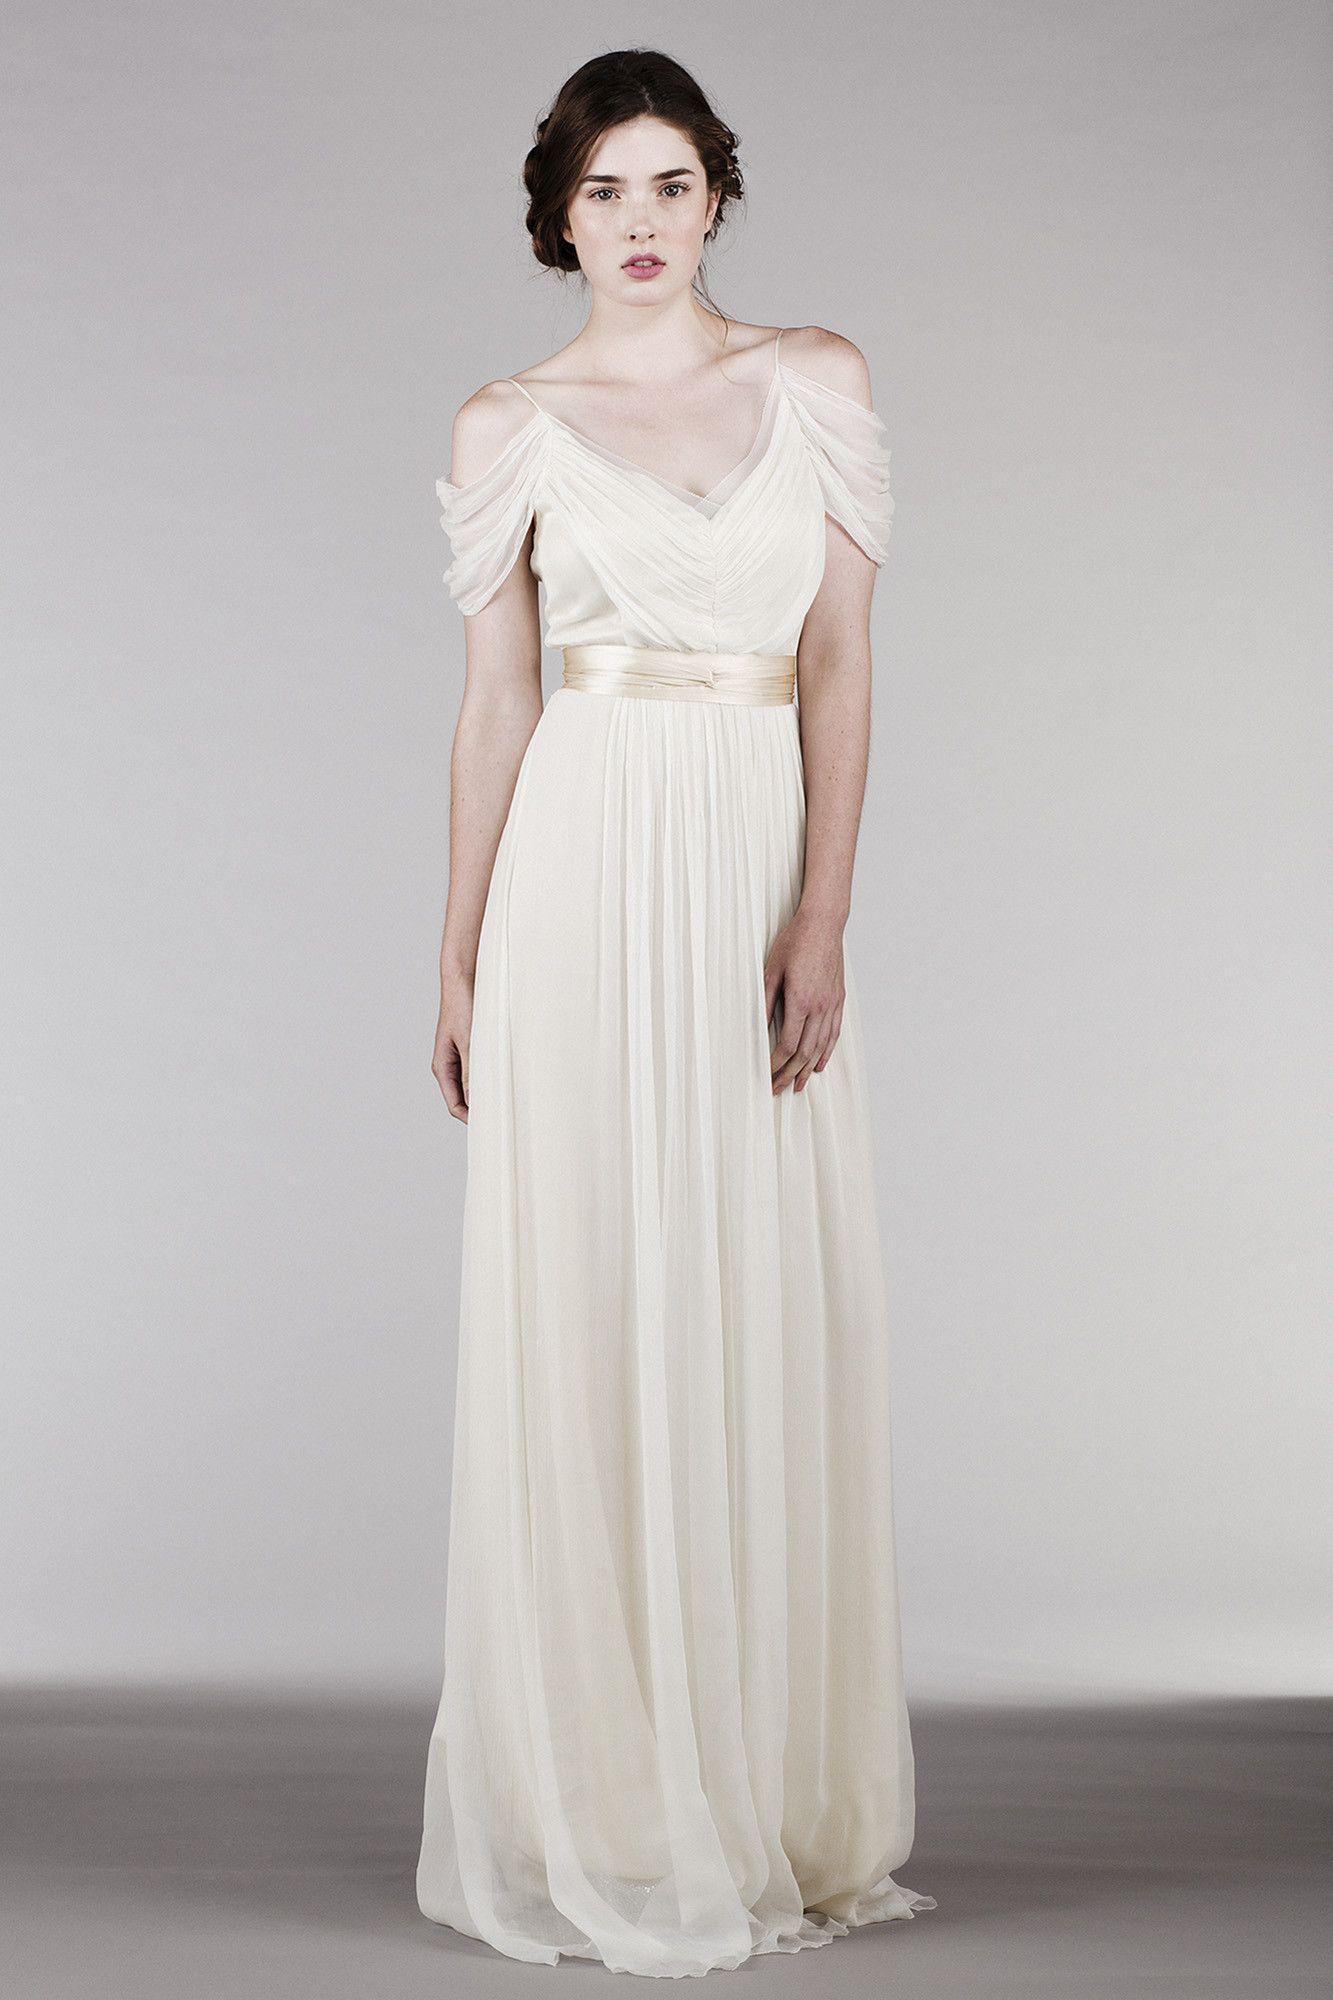 Hb wedding classic and wedding dresses